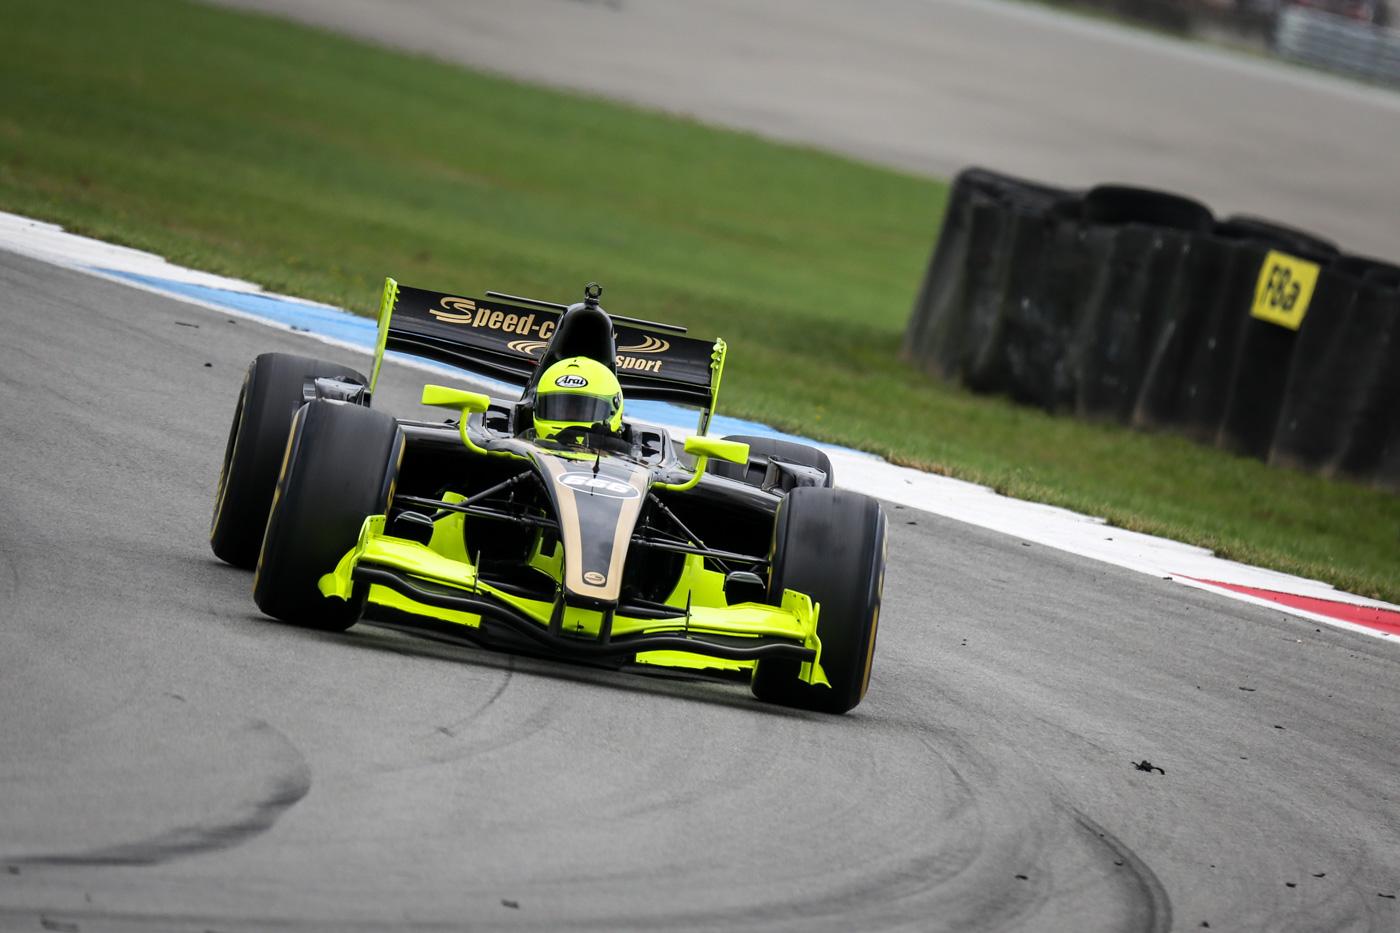 Roy Glaser (Dallara GP2)